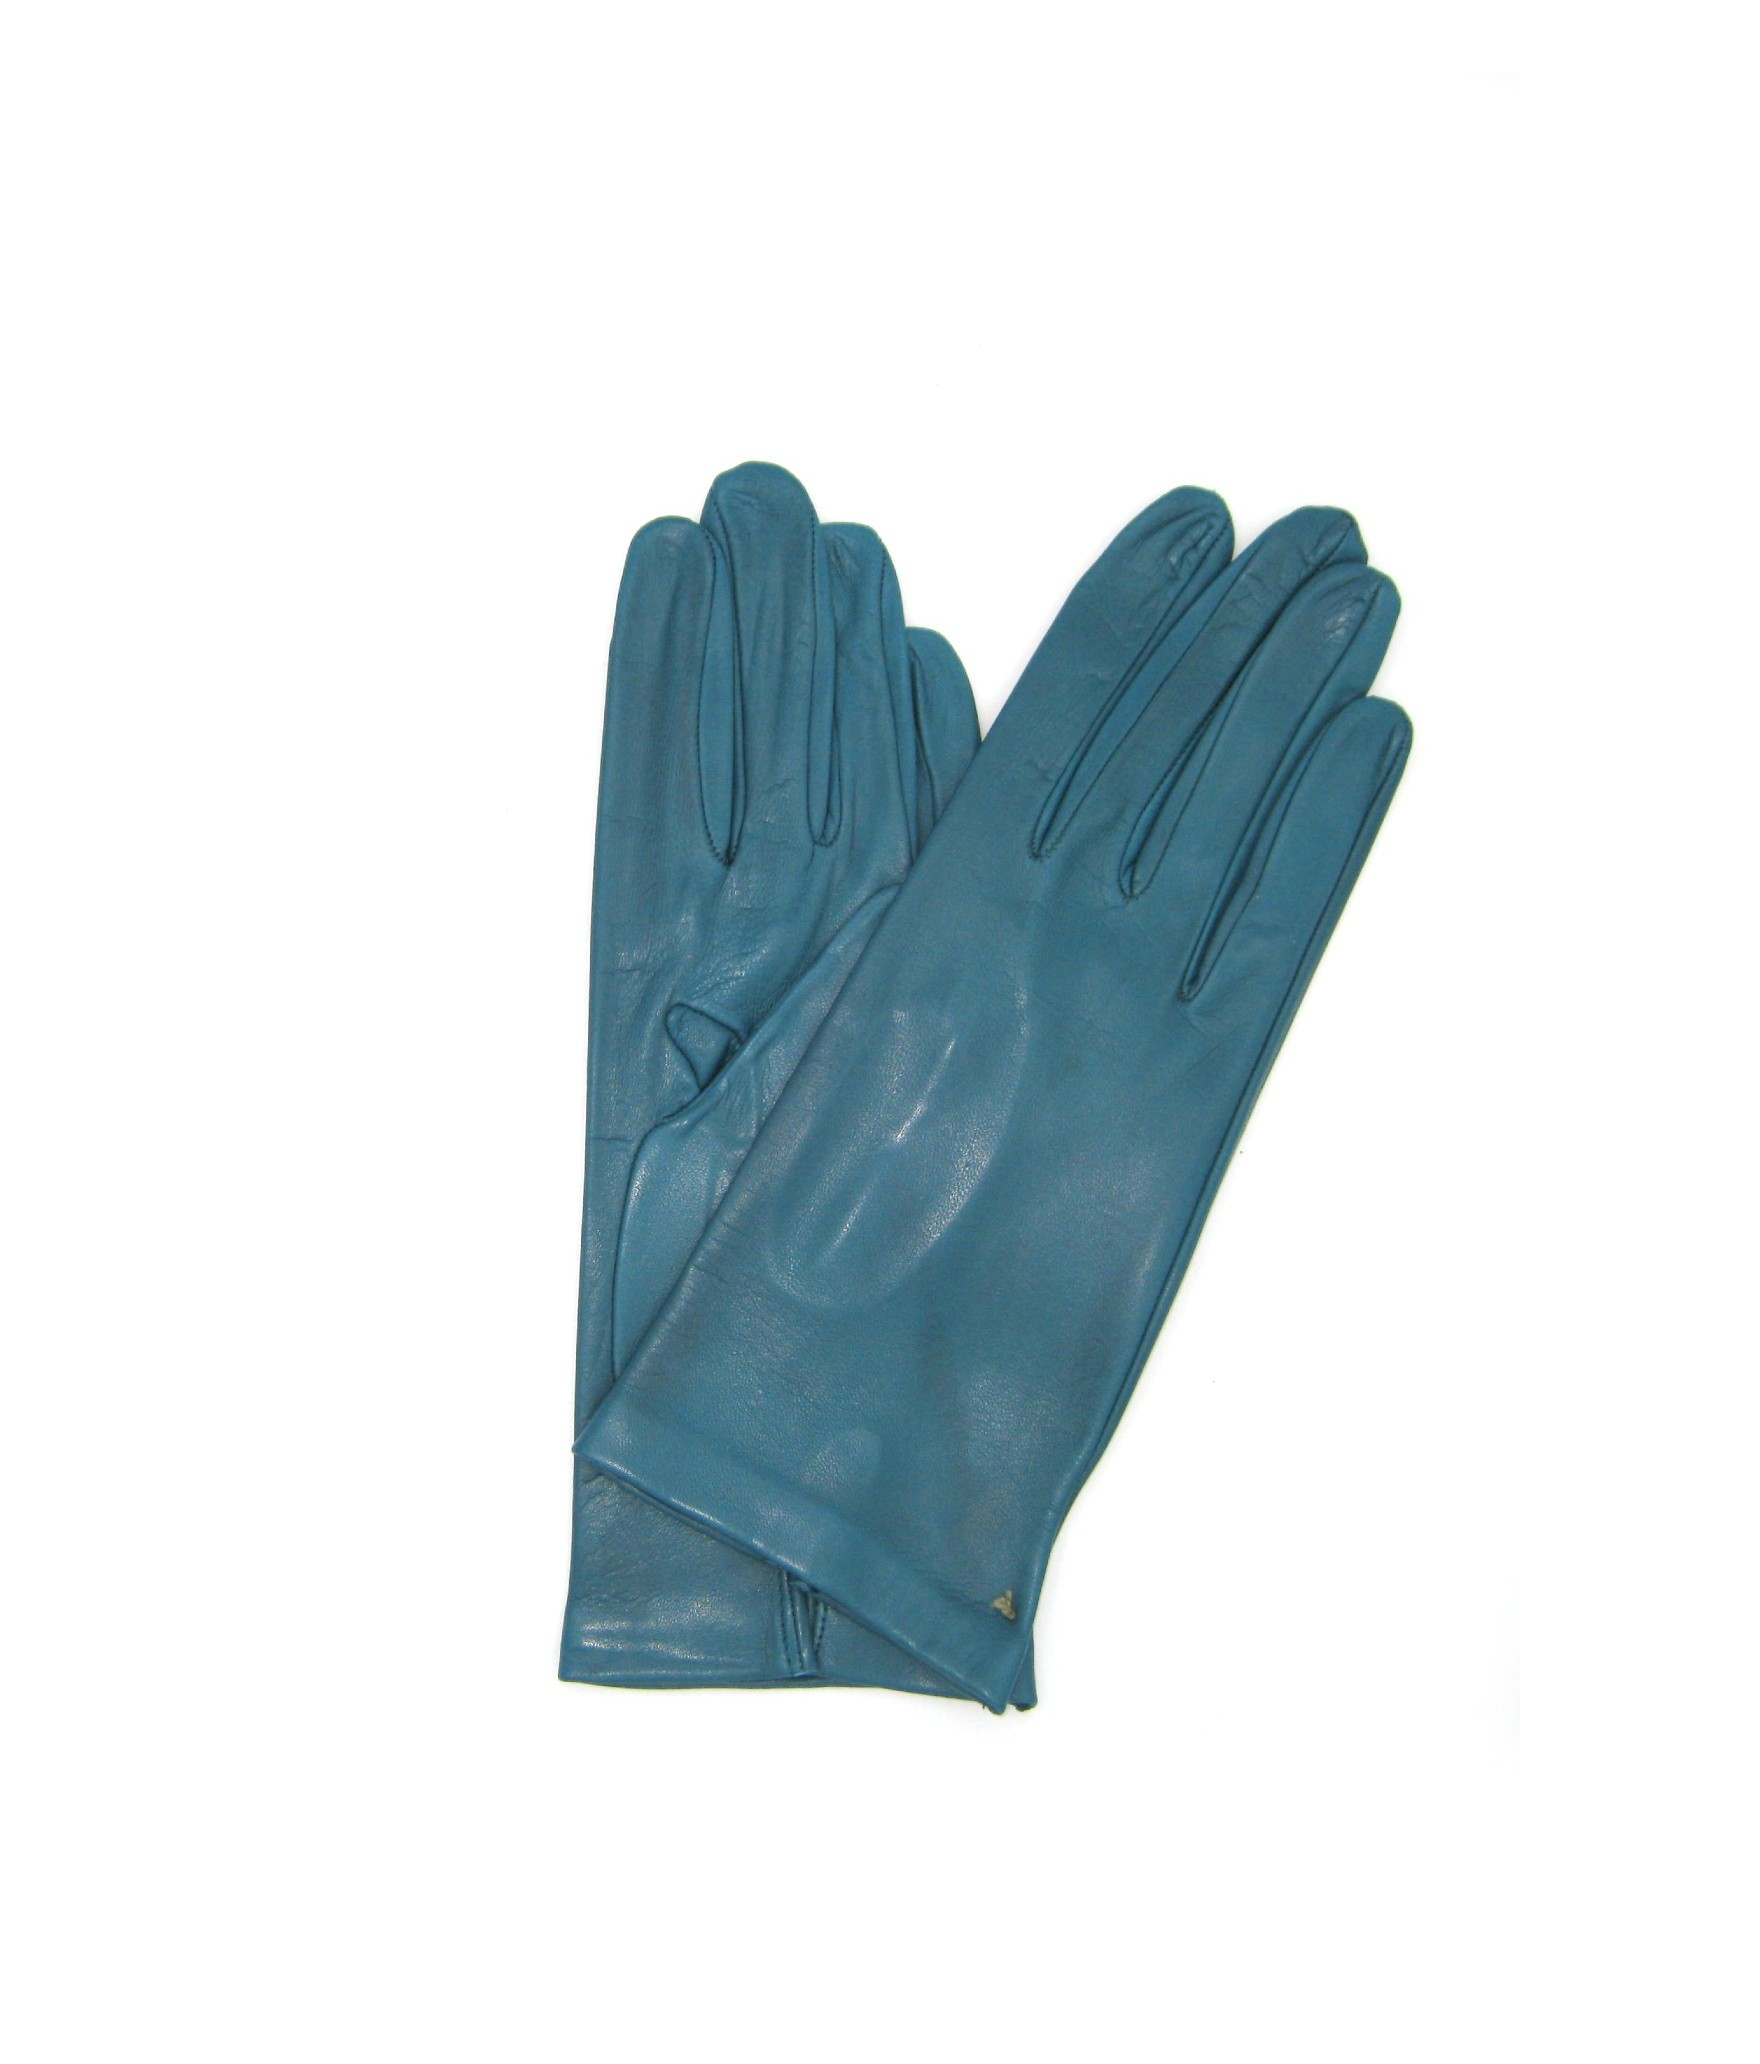 Nappa leather gloves 2bt unlined Petroleum Sermoneta Gloves